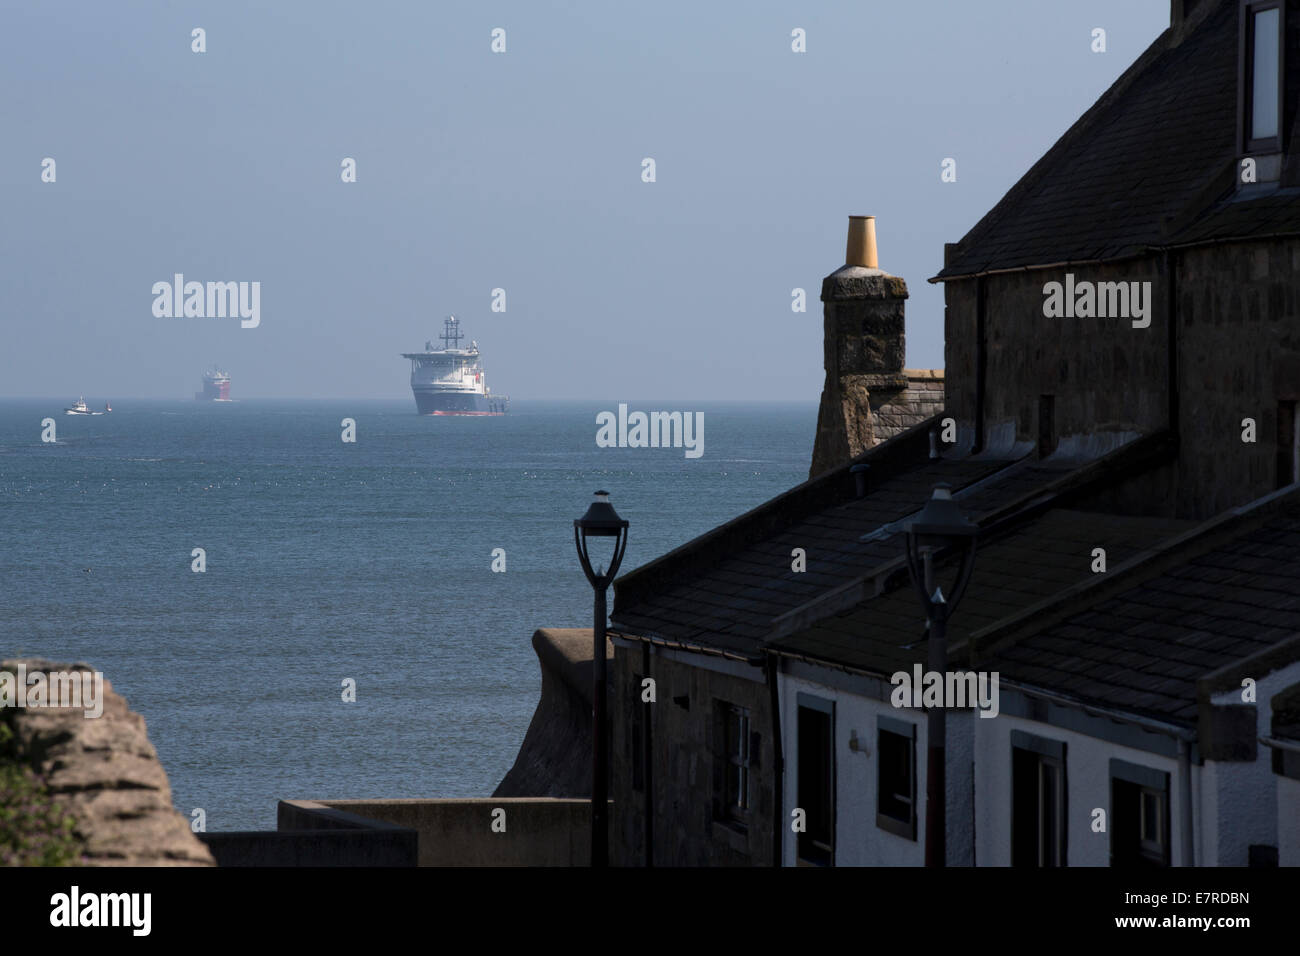 A supply ship sailing towards the historic Footdee area of Aberdeen, Scotland. - Stock Image